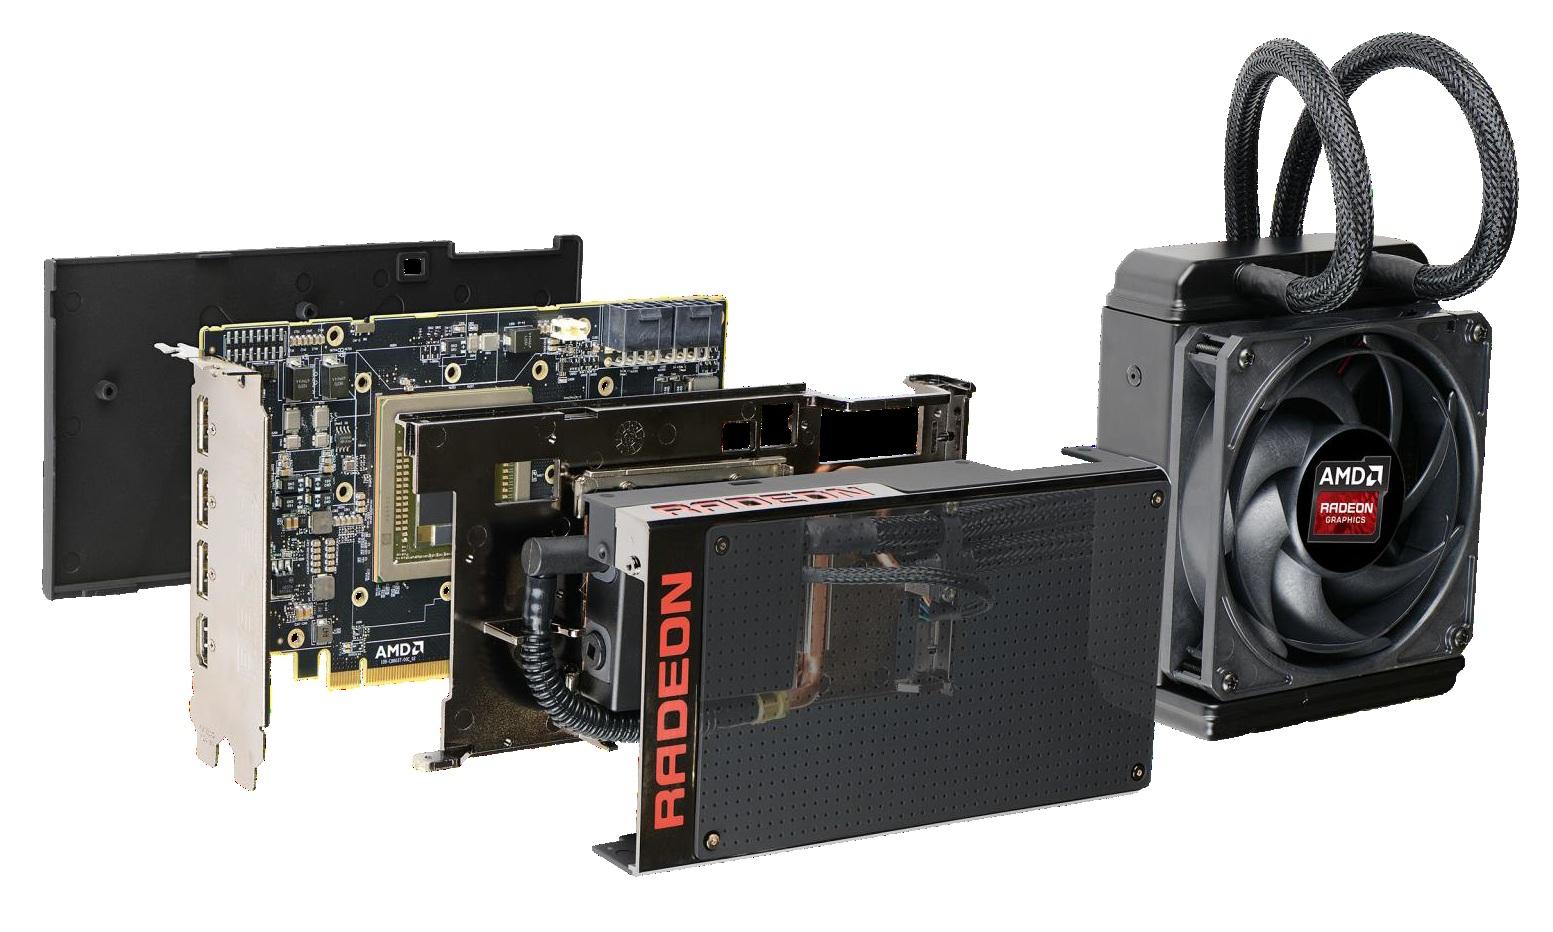 AMD Radeon R9 Fury X in-depth